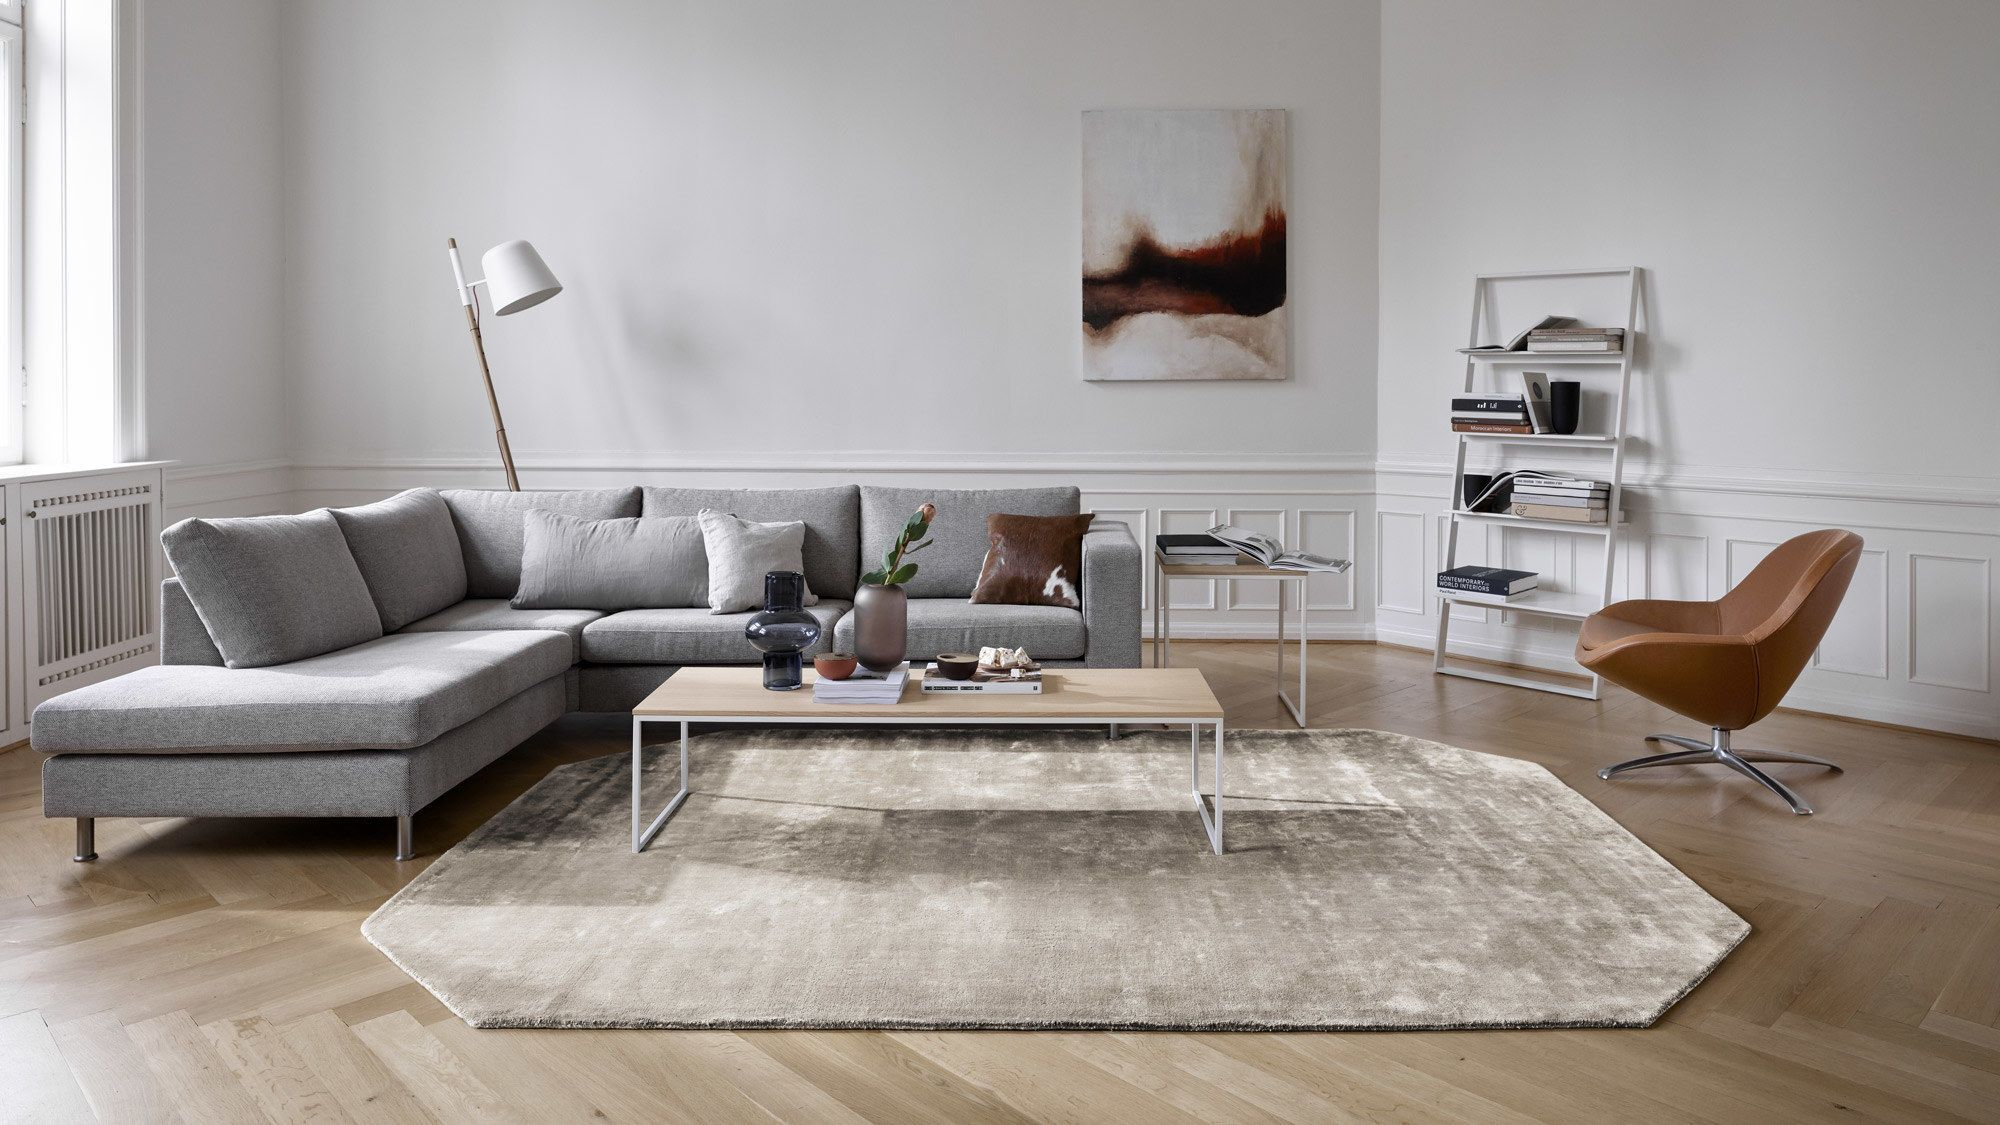 3 Seater Sofas Indivi 2 Sofa Boconcept Living Room Decor Modern Living Room Modern Furniture